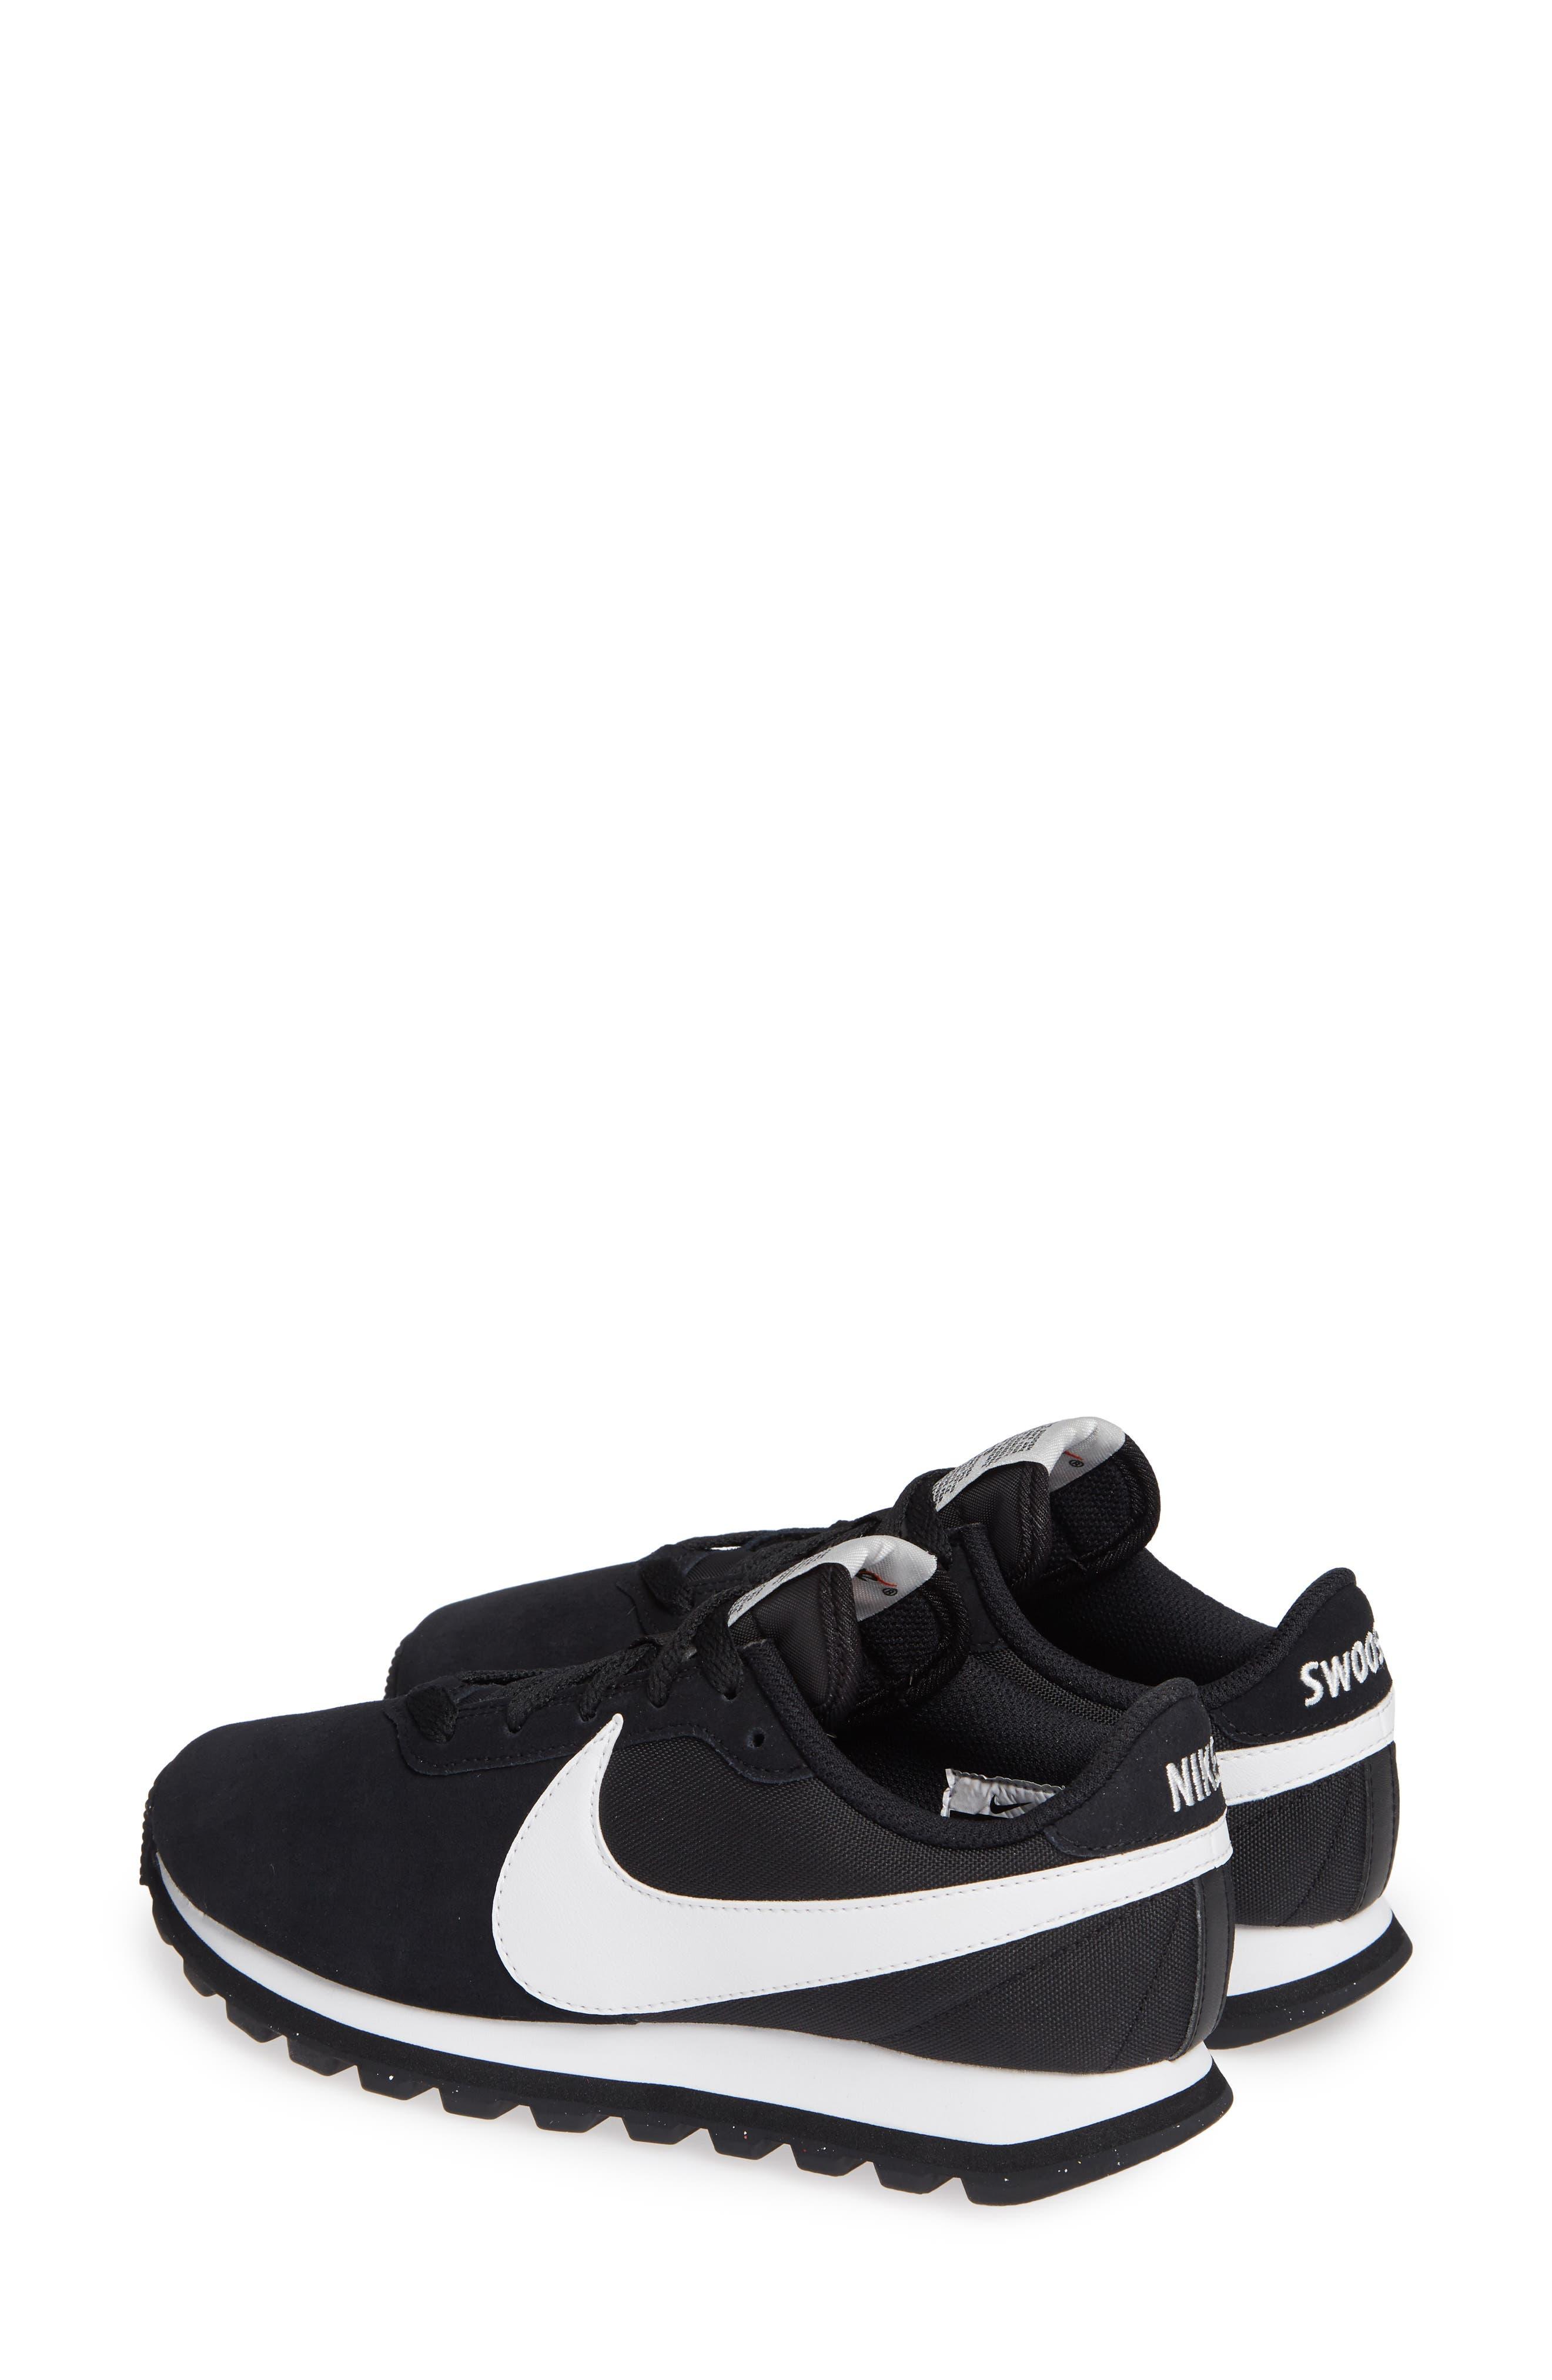 Pre Love O.X. Sneaker,                             Alternate thumbnail 2, color,                             Black/ Summit White